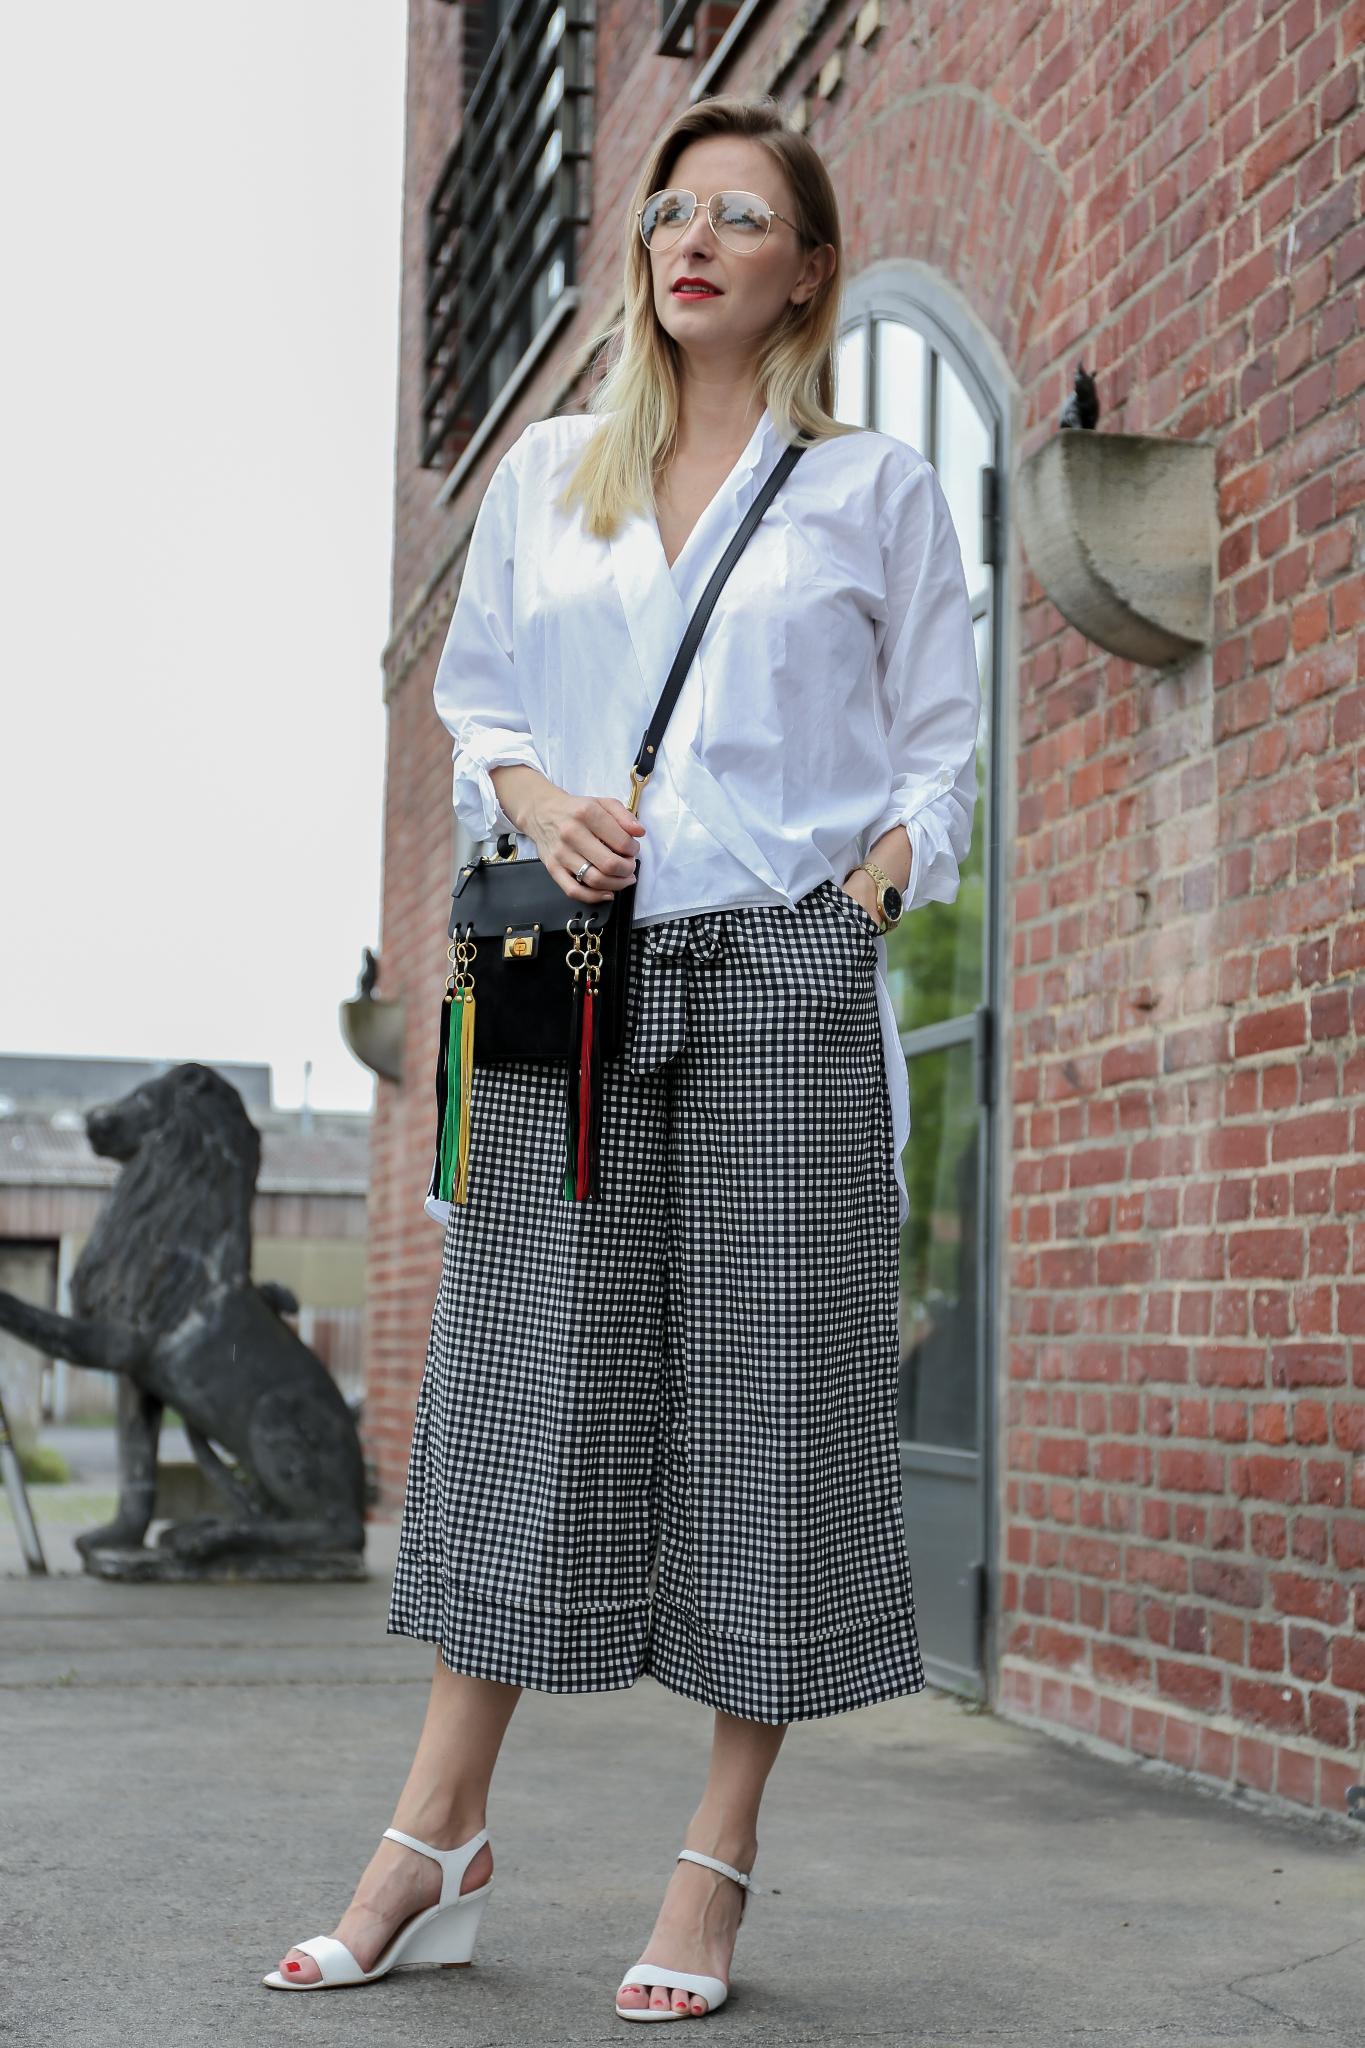 Fashion_Outfit_Chloé_Jane_Vichy_Print_MOD - by Monique